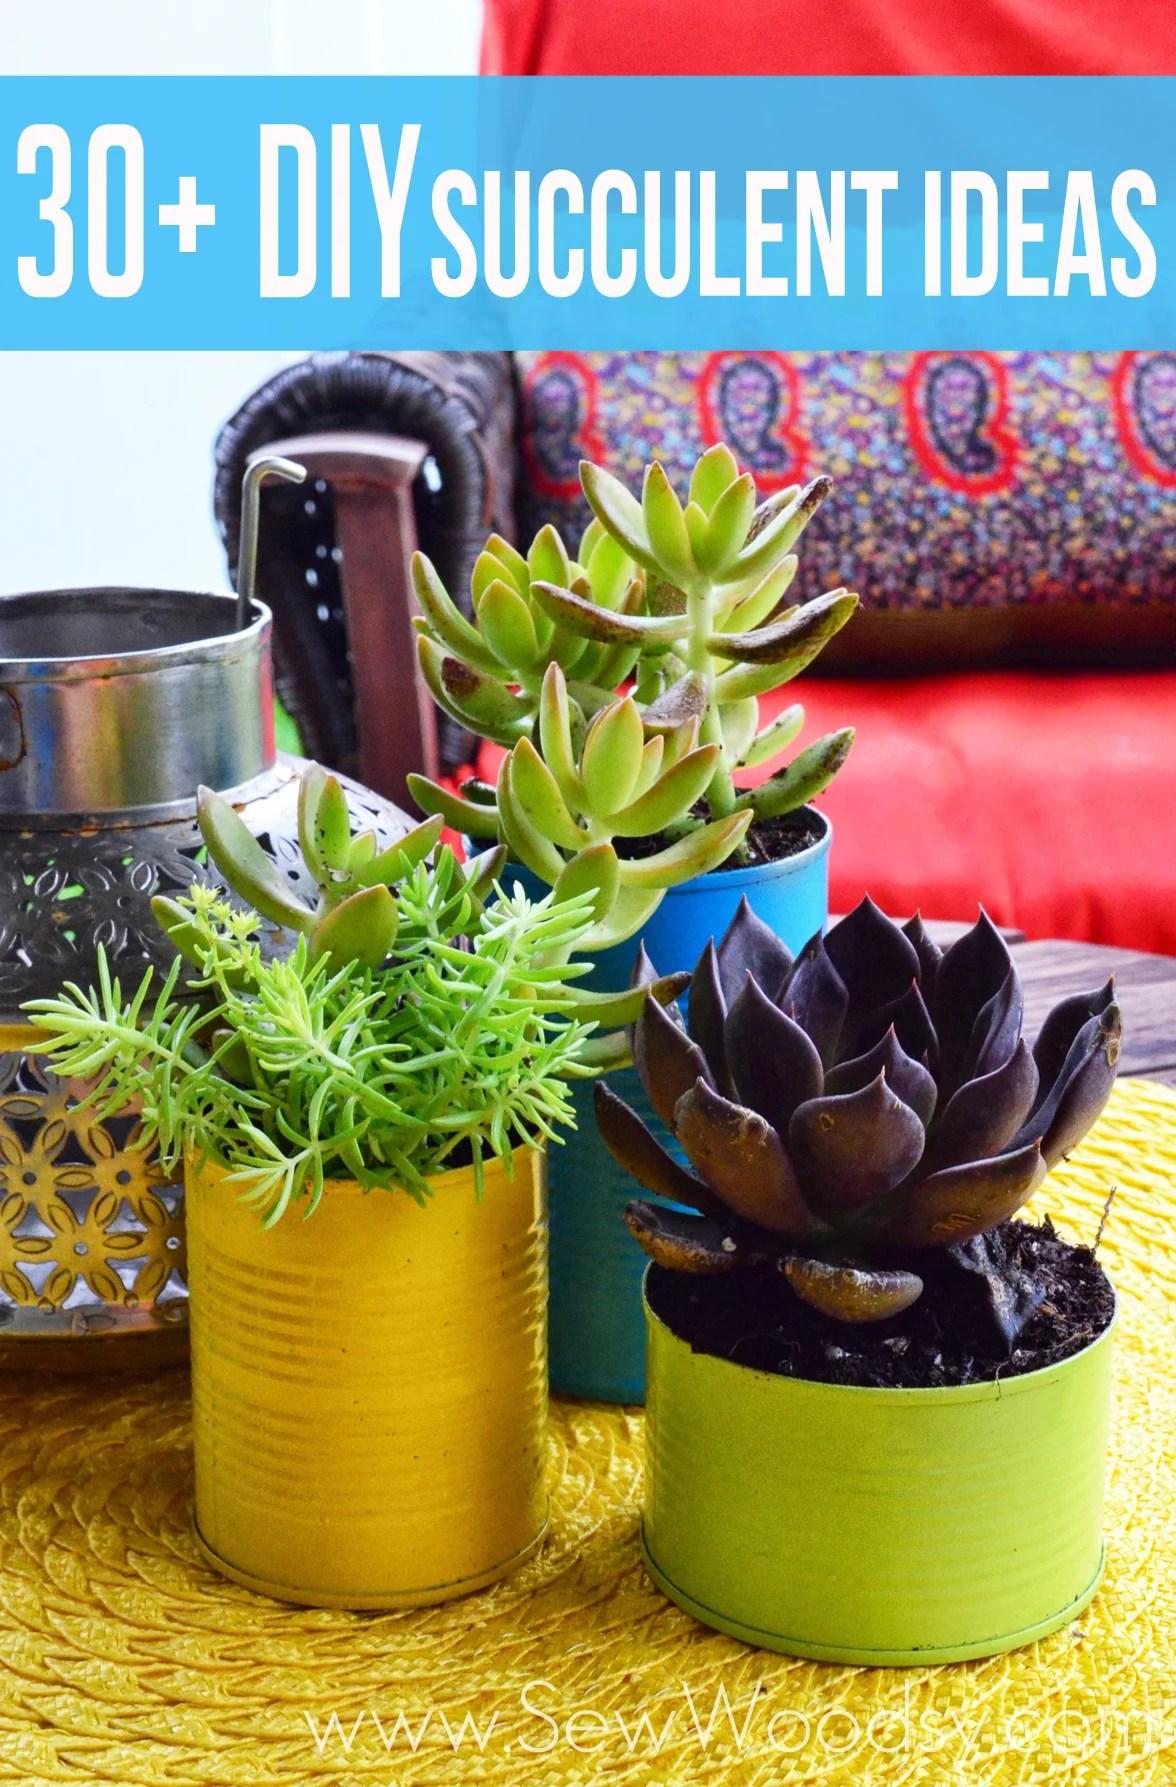 30+ DIY Succulent Ideas from SewWoodsy.com